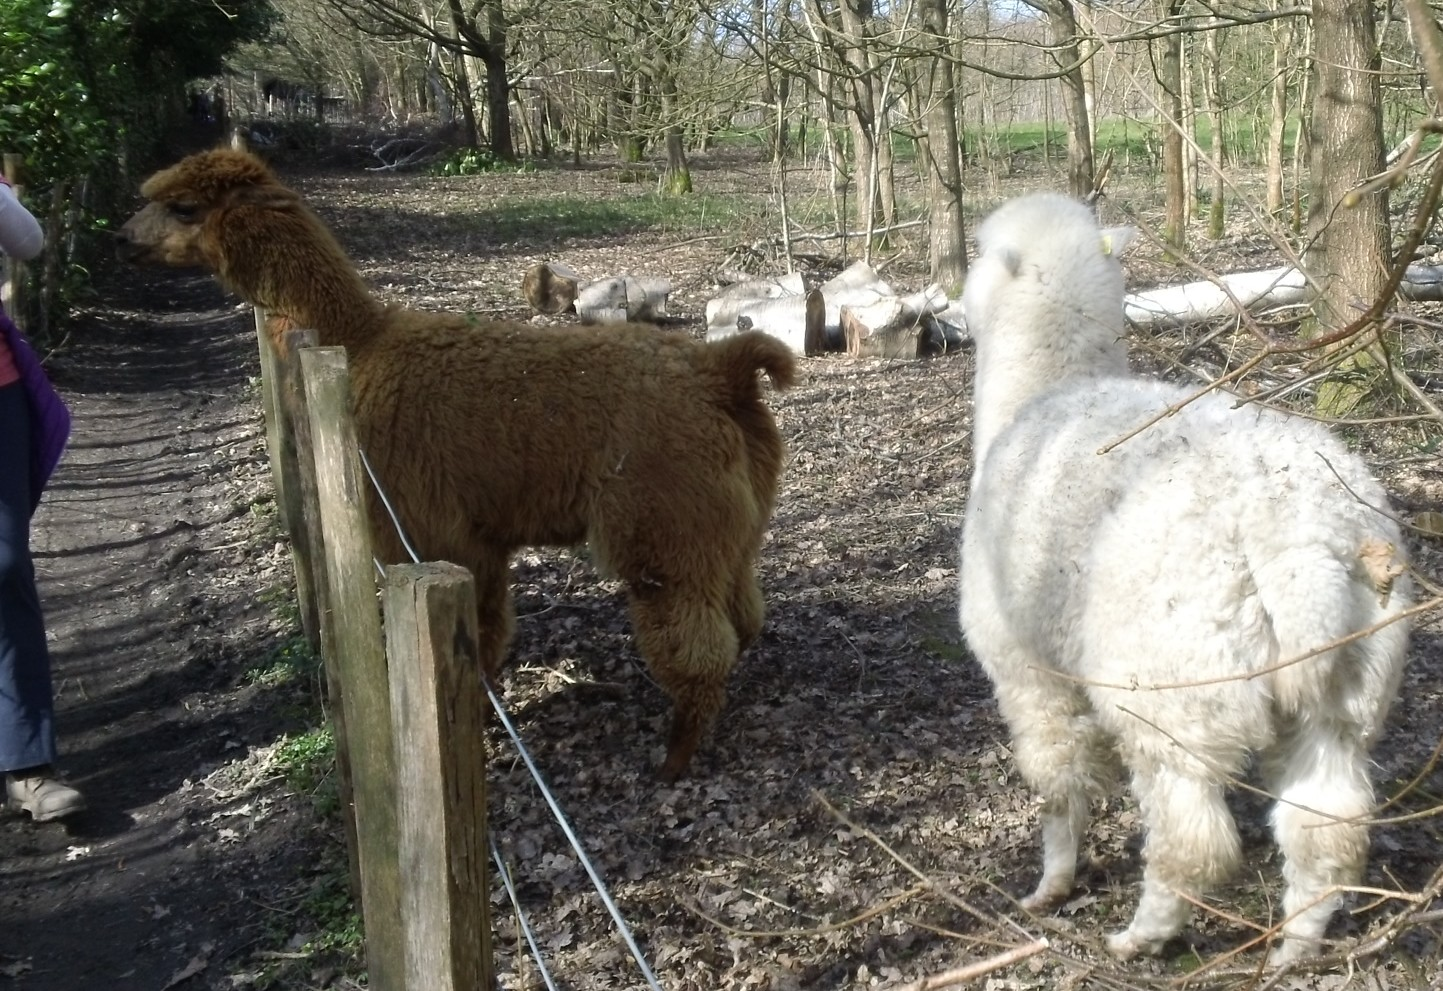 Curious llamas Eden Valley walk route, Kent